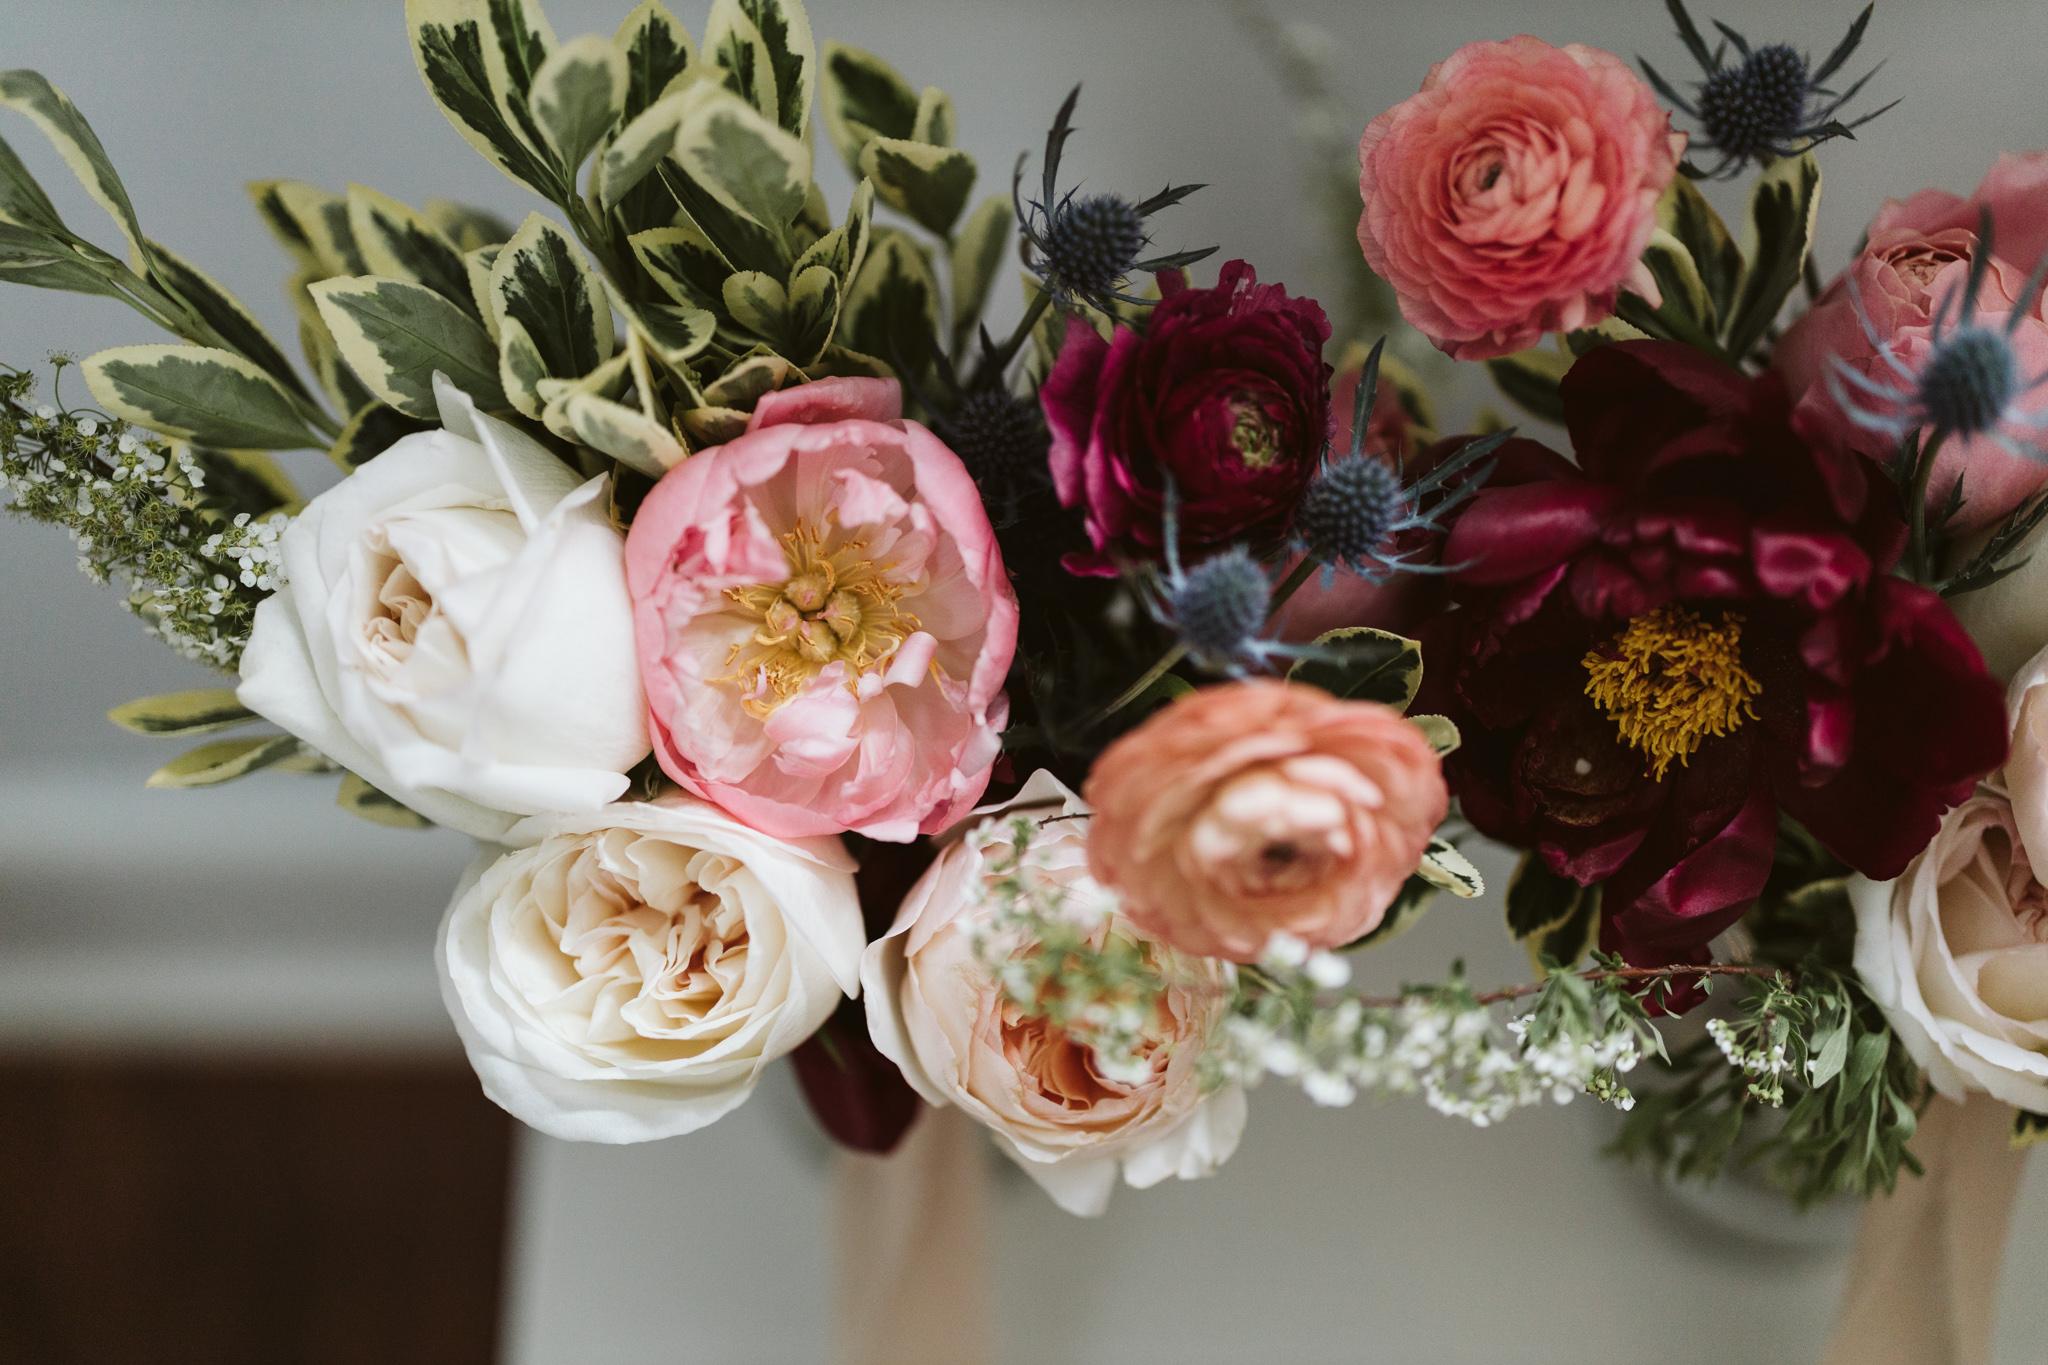 Olive_and_June_Florals-1.jpg